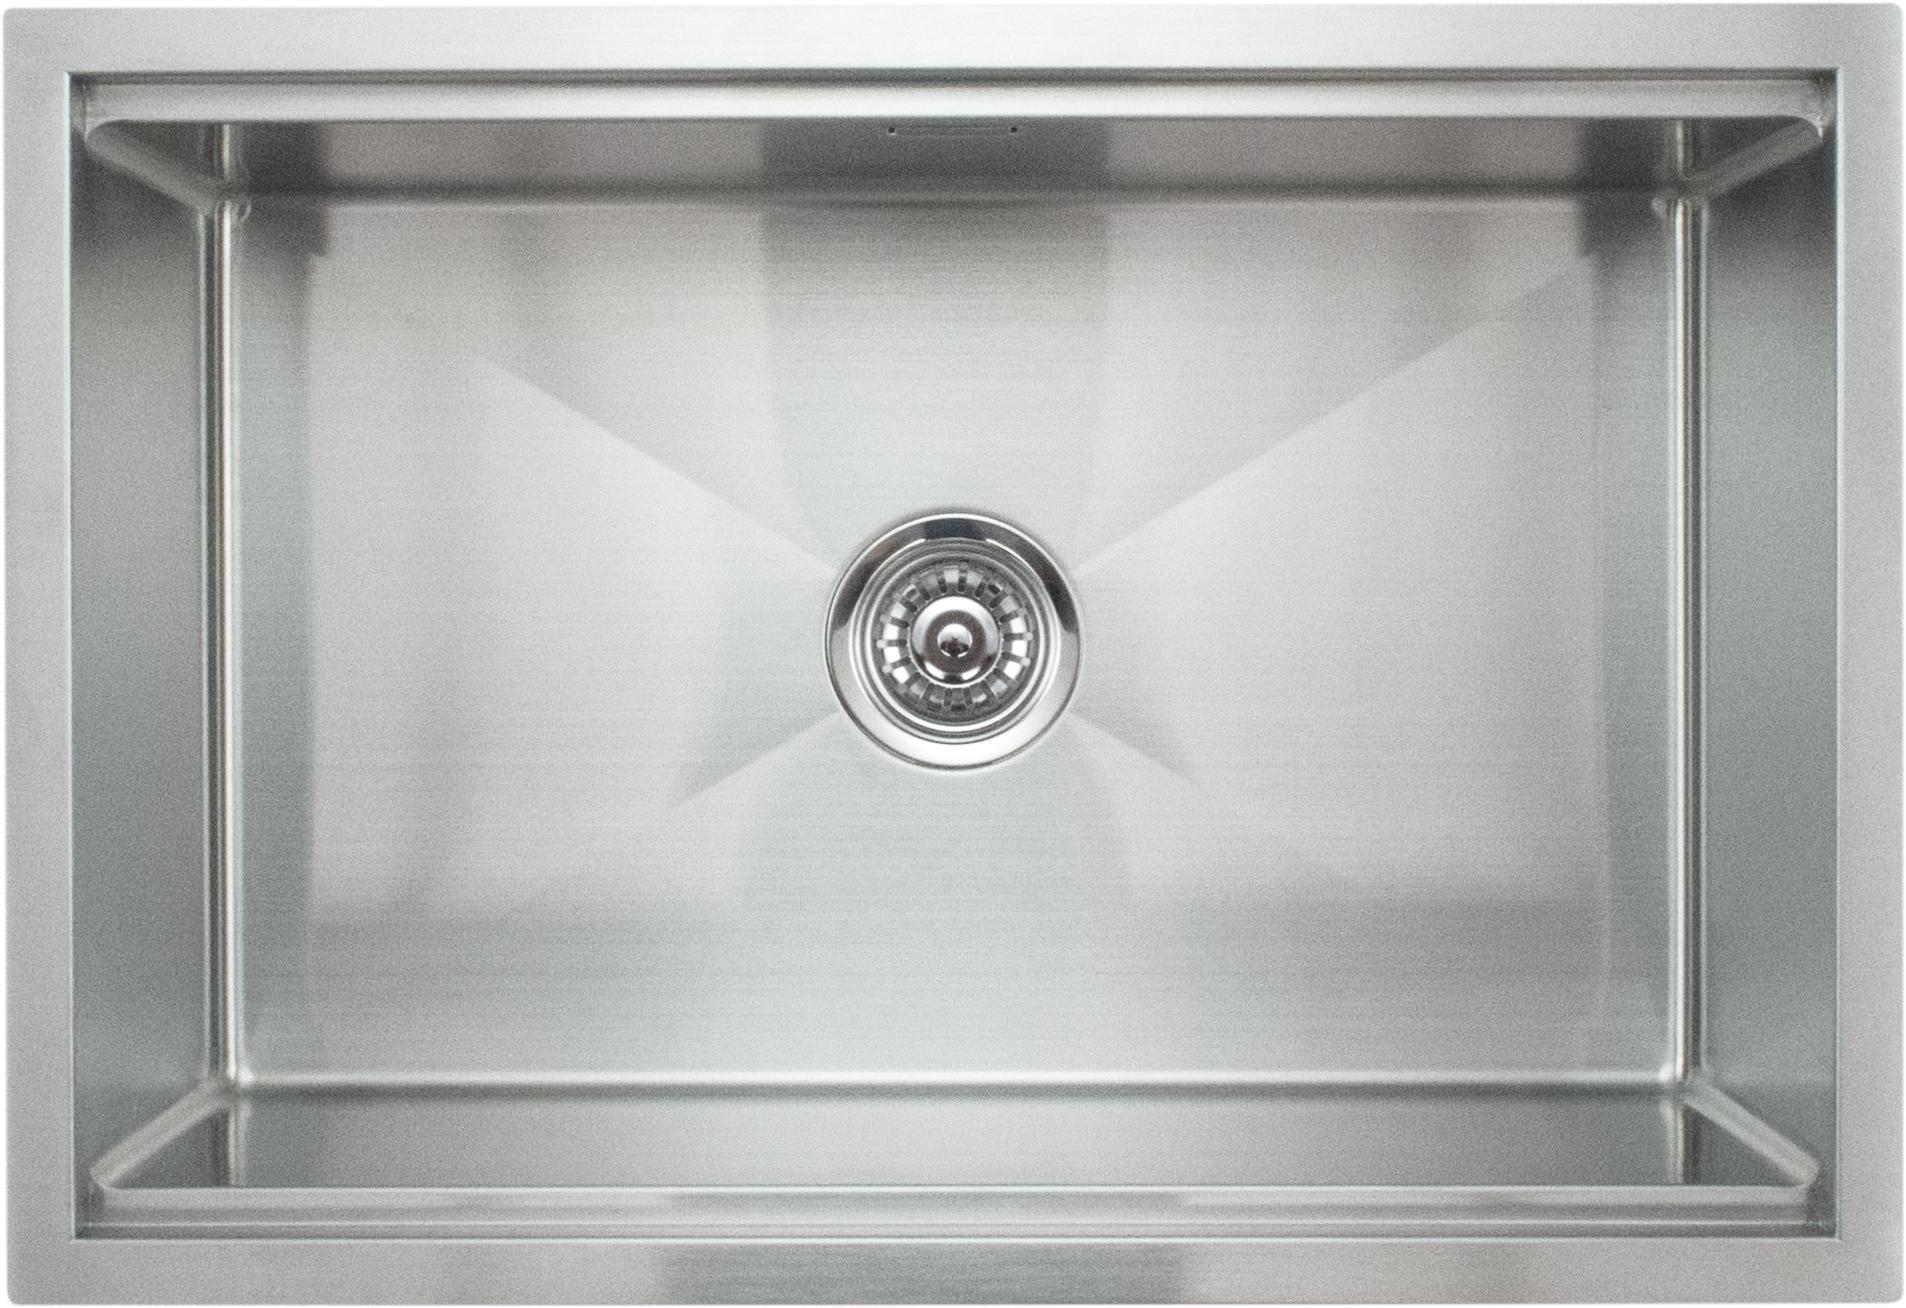 Sink Station Medium IK8650 – Ikon Commercial